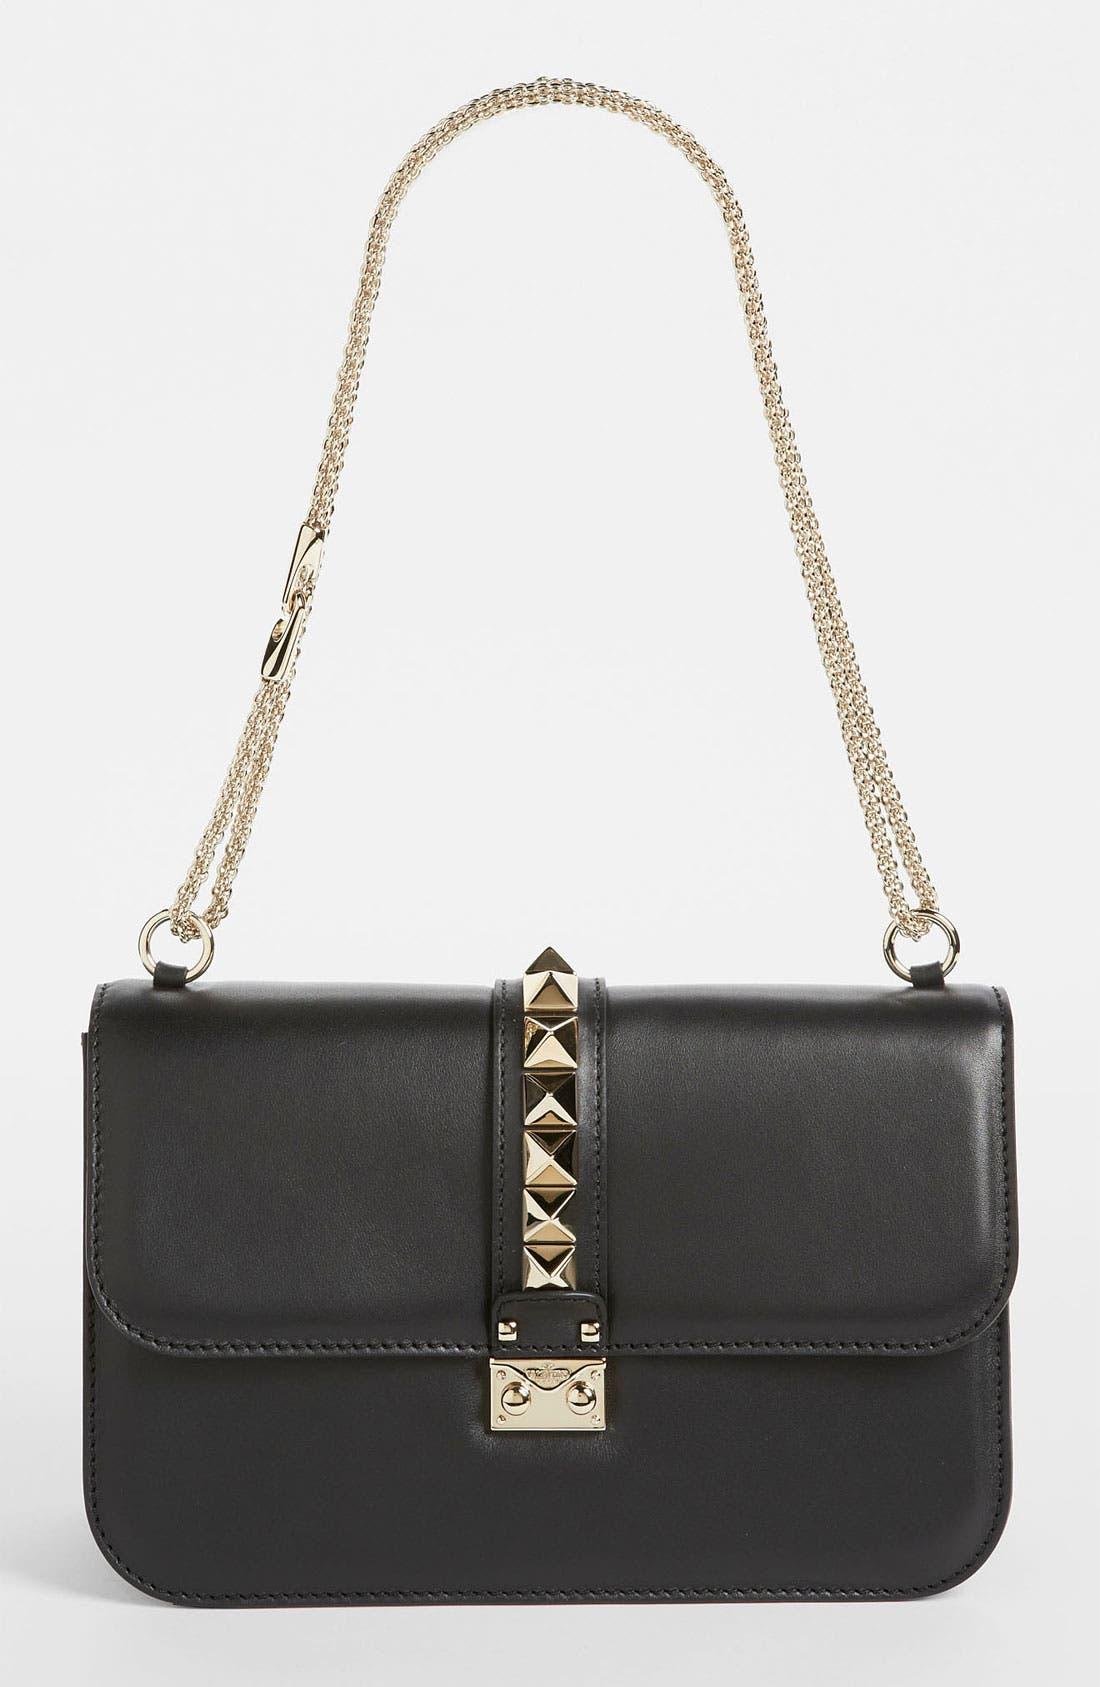 Main Image - Valentino 'Lock - Medium' Leather Shoulder Bag